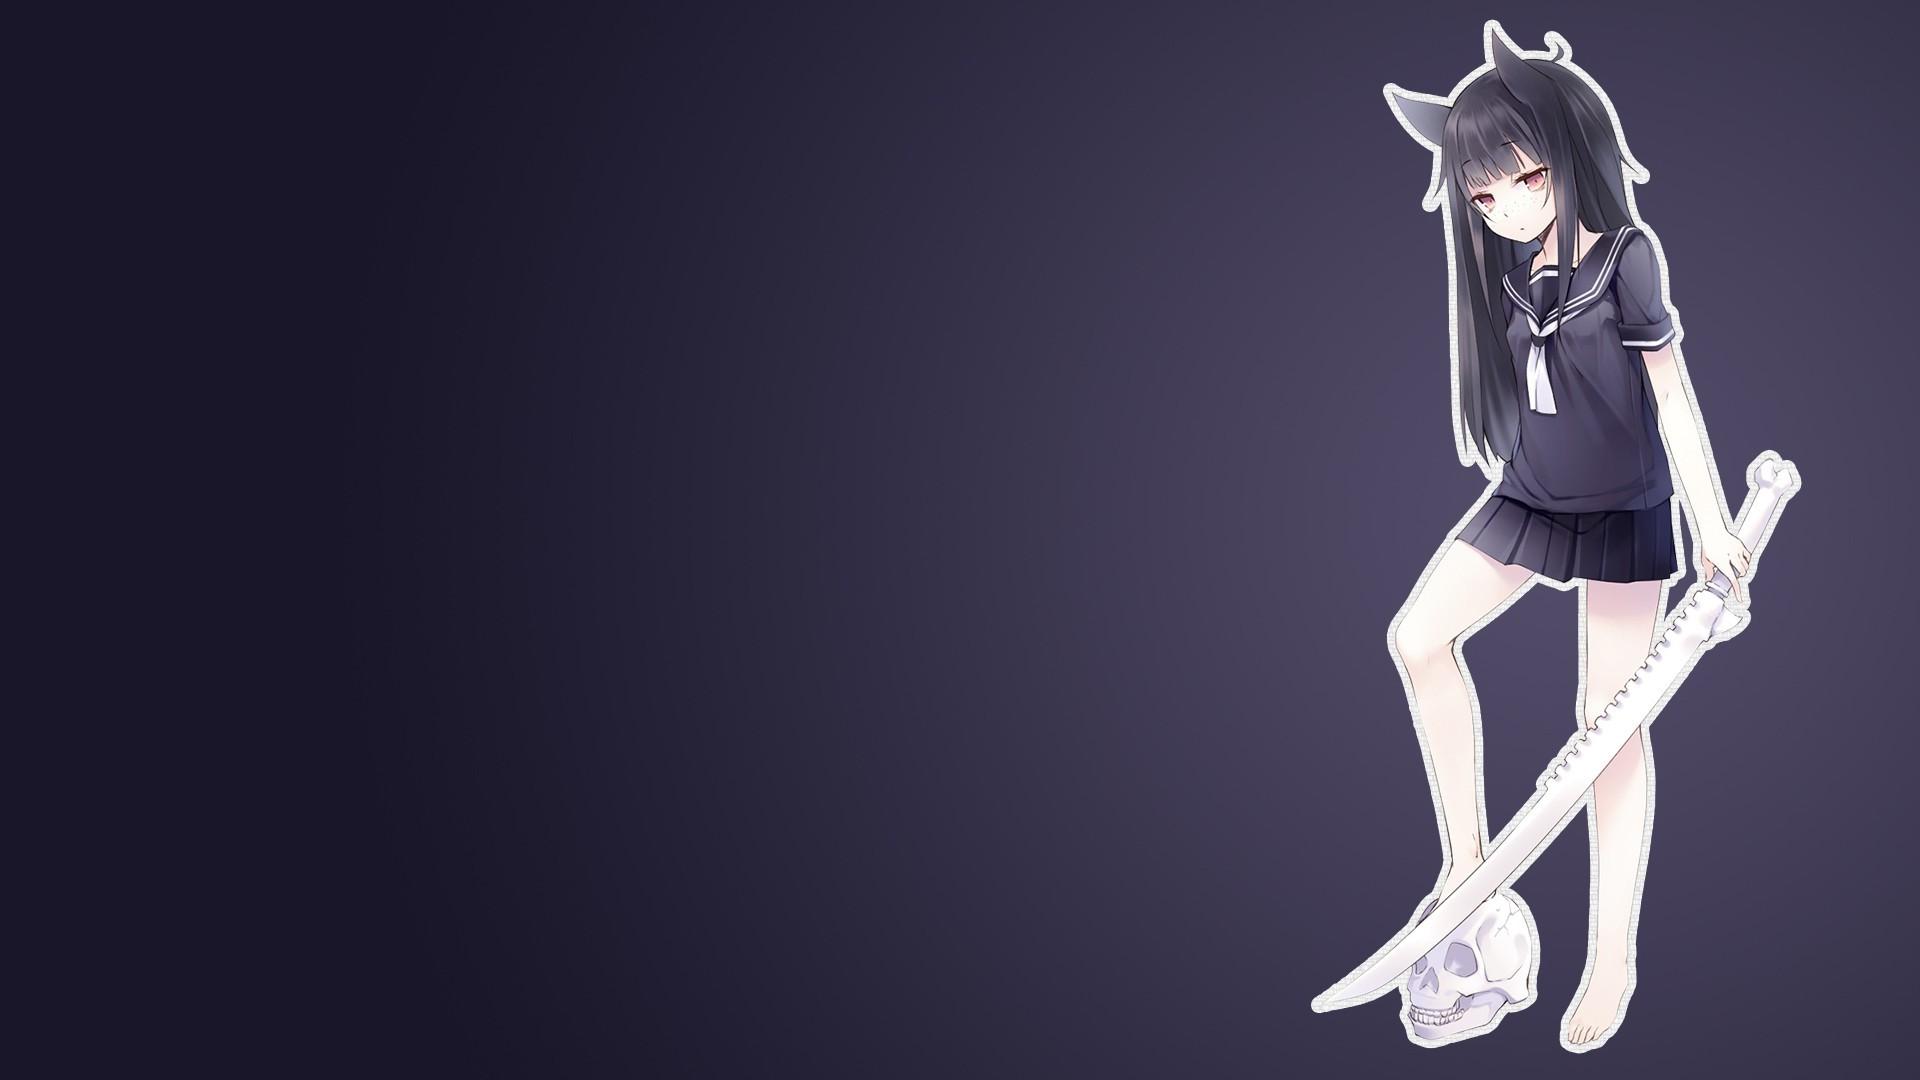 anime, Anime Girls, Simple Background, Original Characters, Nekomu,  Gradient, Nekomimi, Animal Ears, Sword, Skull, School Uniform, Red Eyes,  Black Hair, …